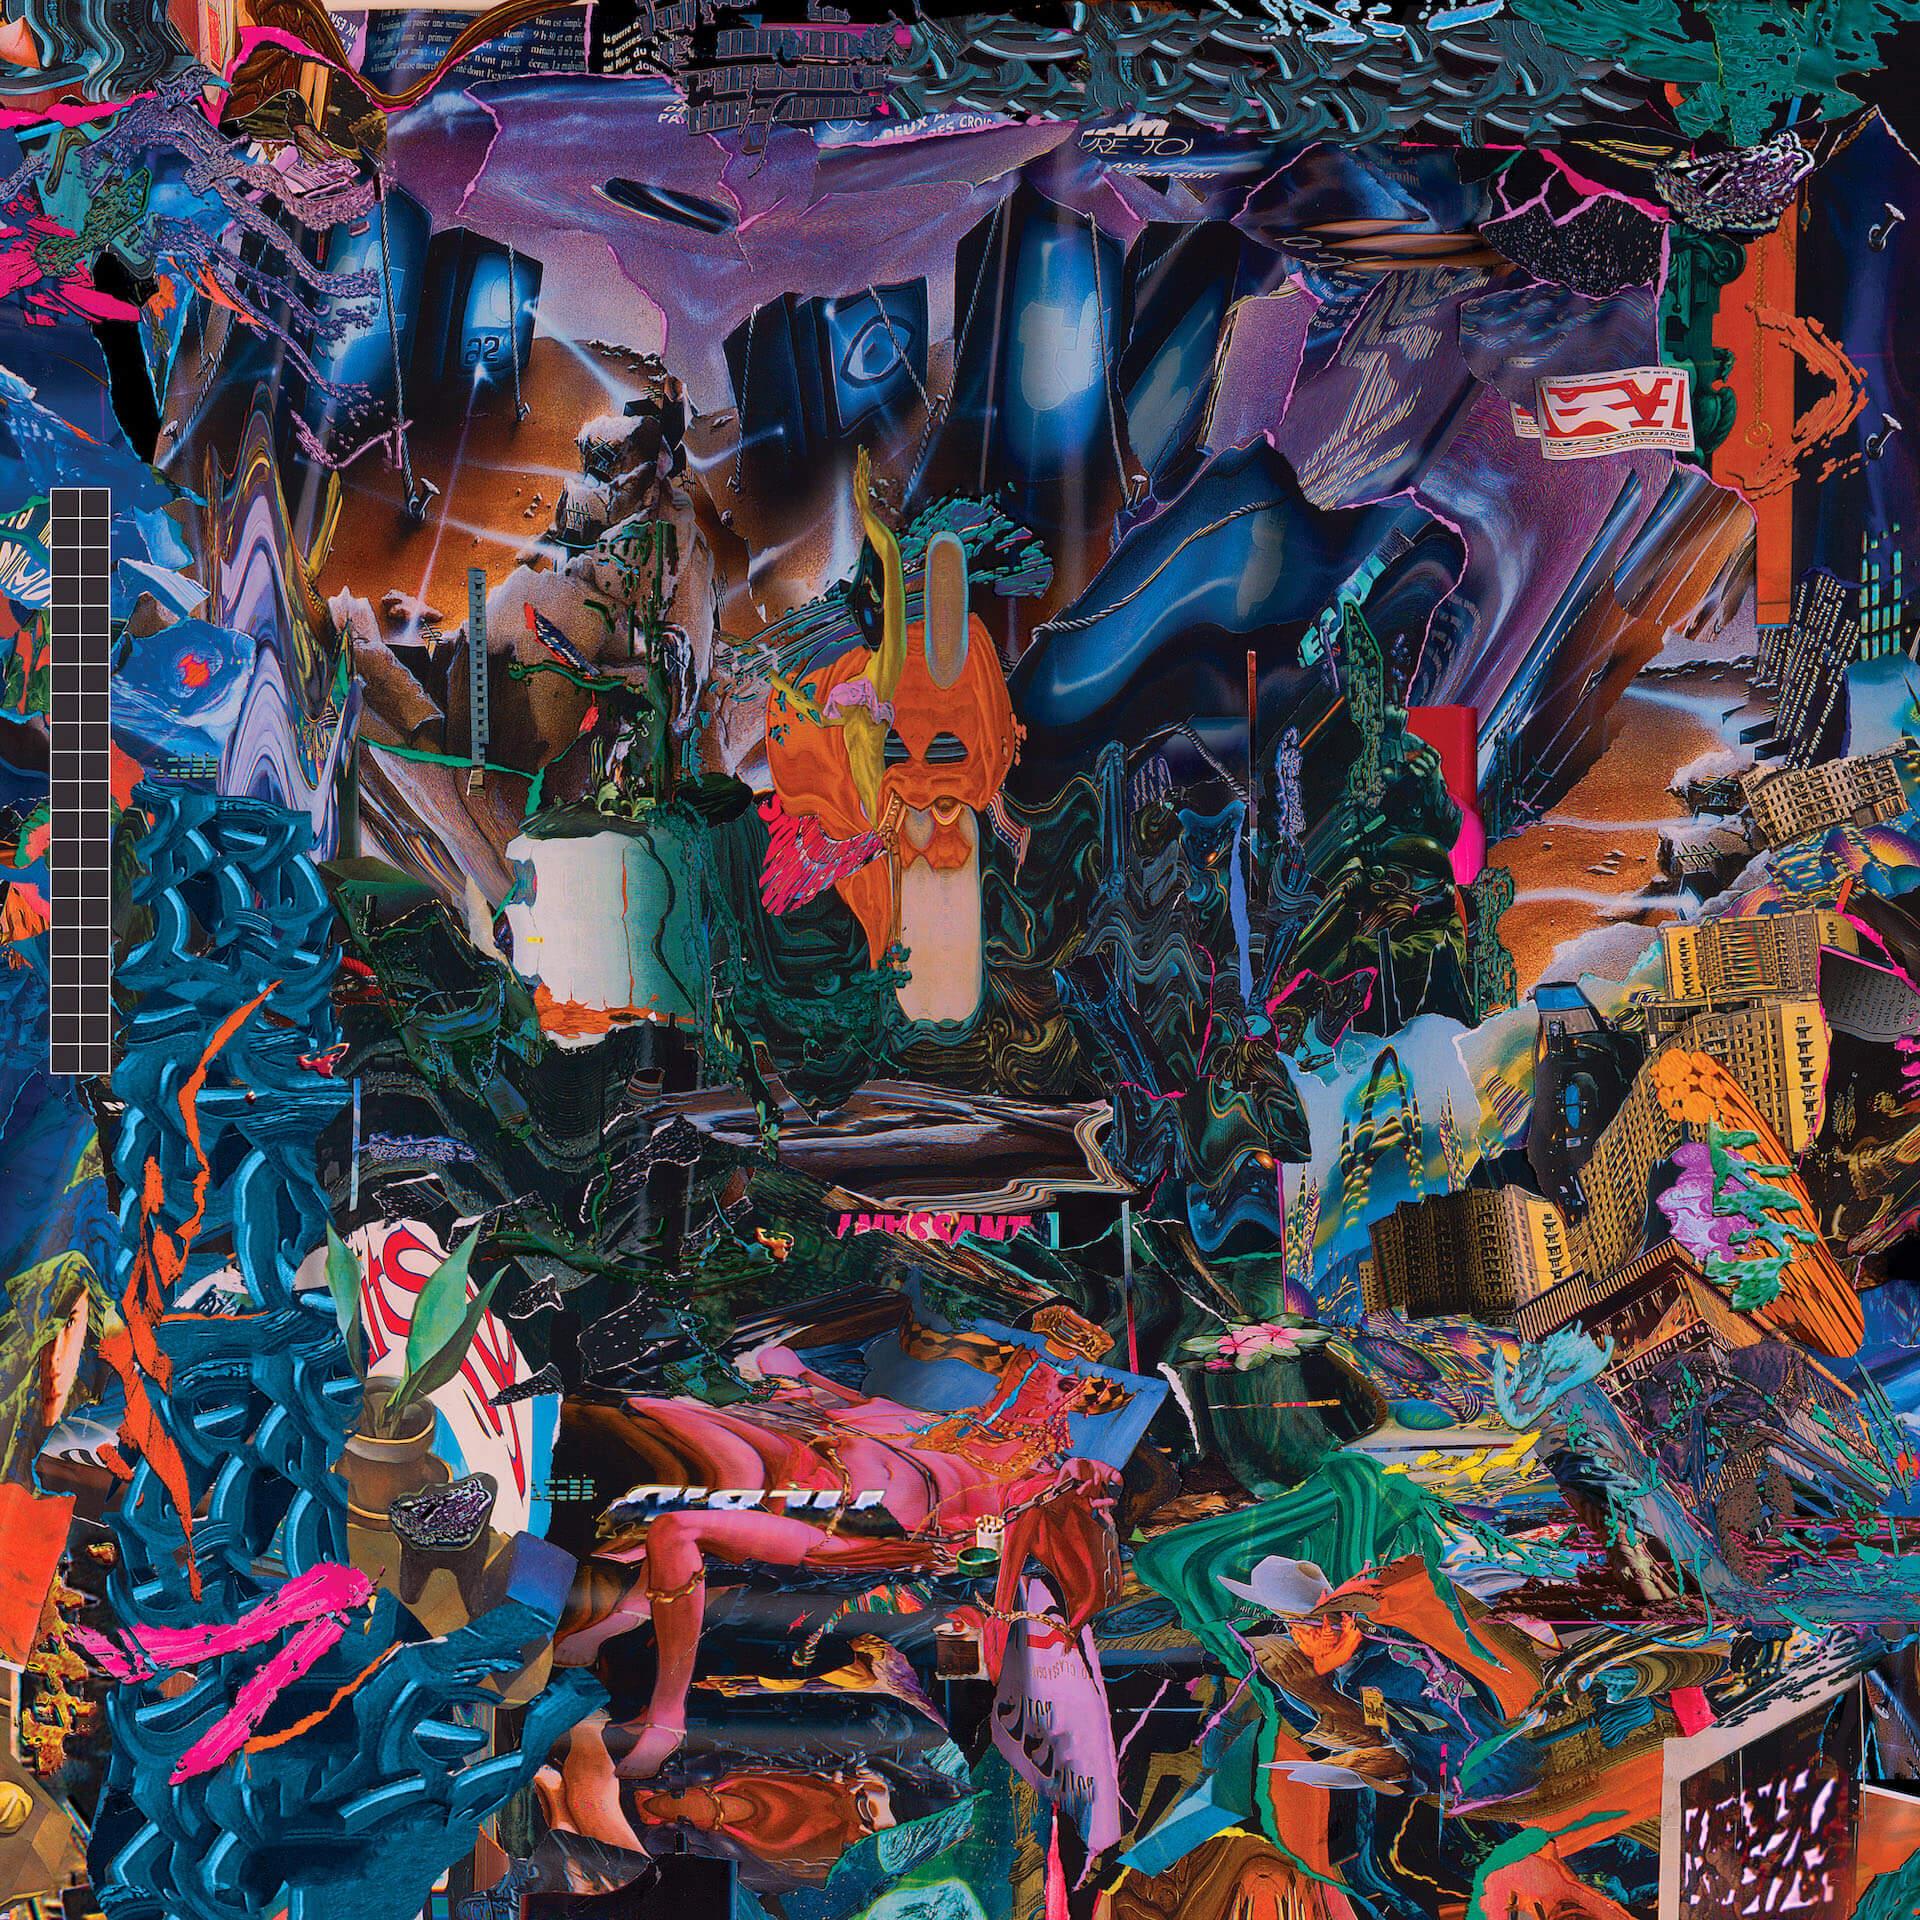 2ndアルバム『Cavalcade』をリリースしたblack midiによるジャパンツアーが開催決定!東京・大阪・名古屋を周遊 music210610_blackmidi_tour_4